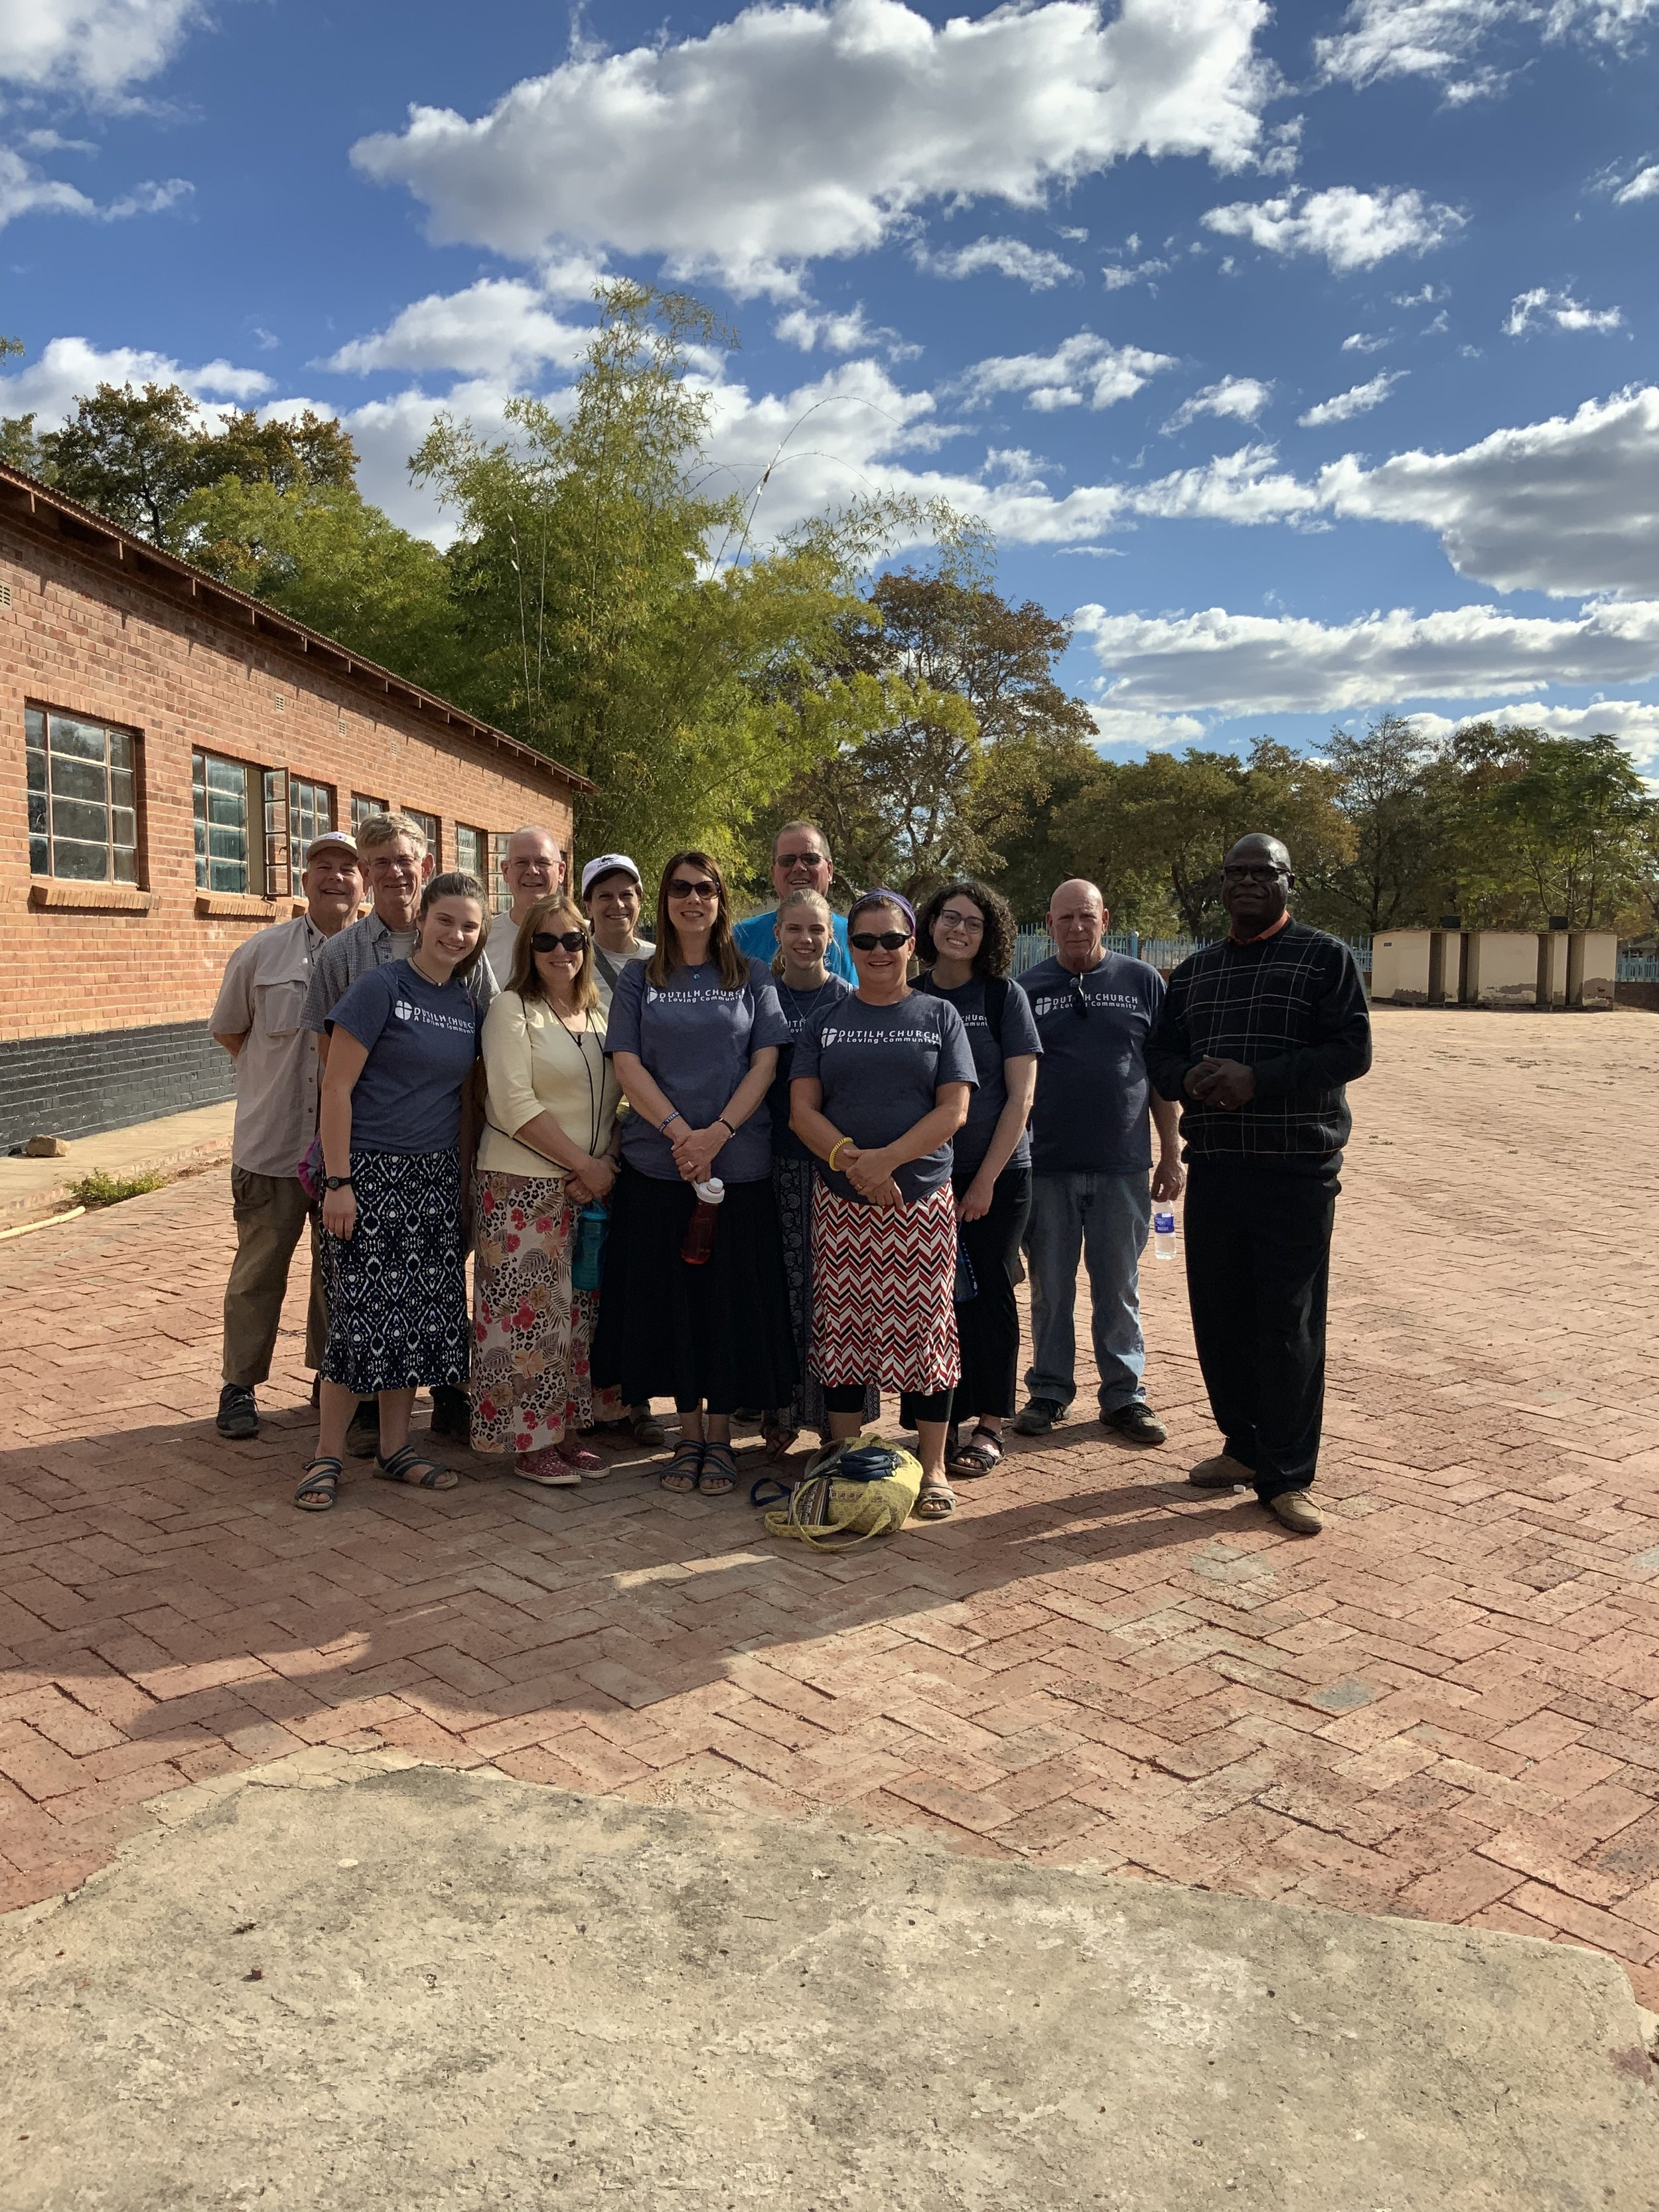 Dutilh Church's TNC mission team pauses for a group photo. Photo by Pete Ekstam.